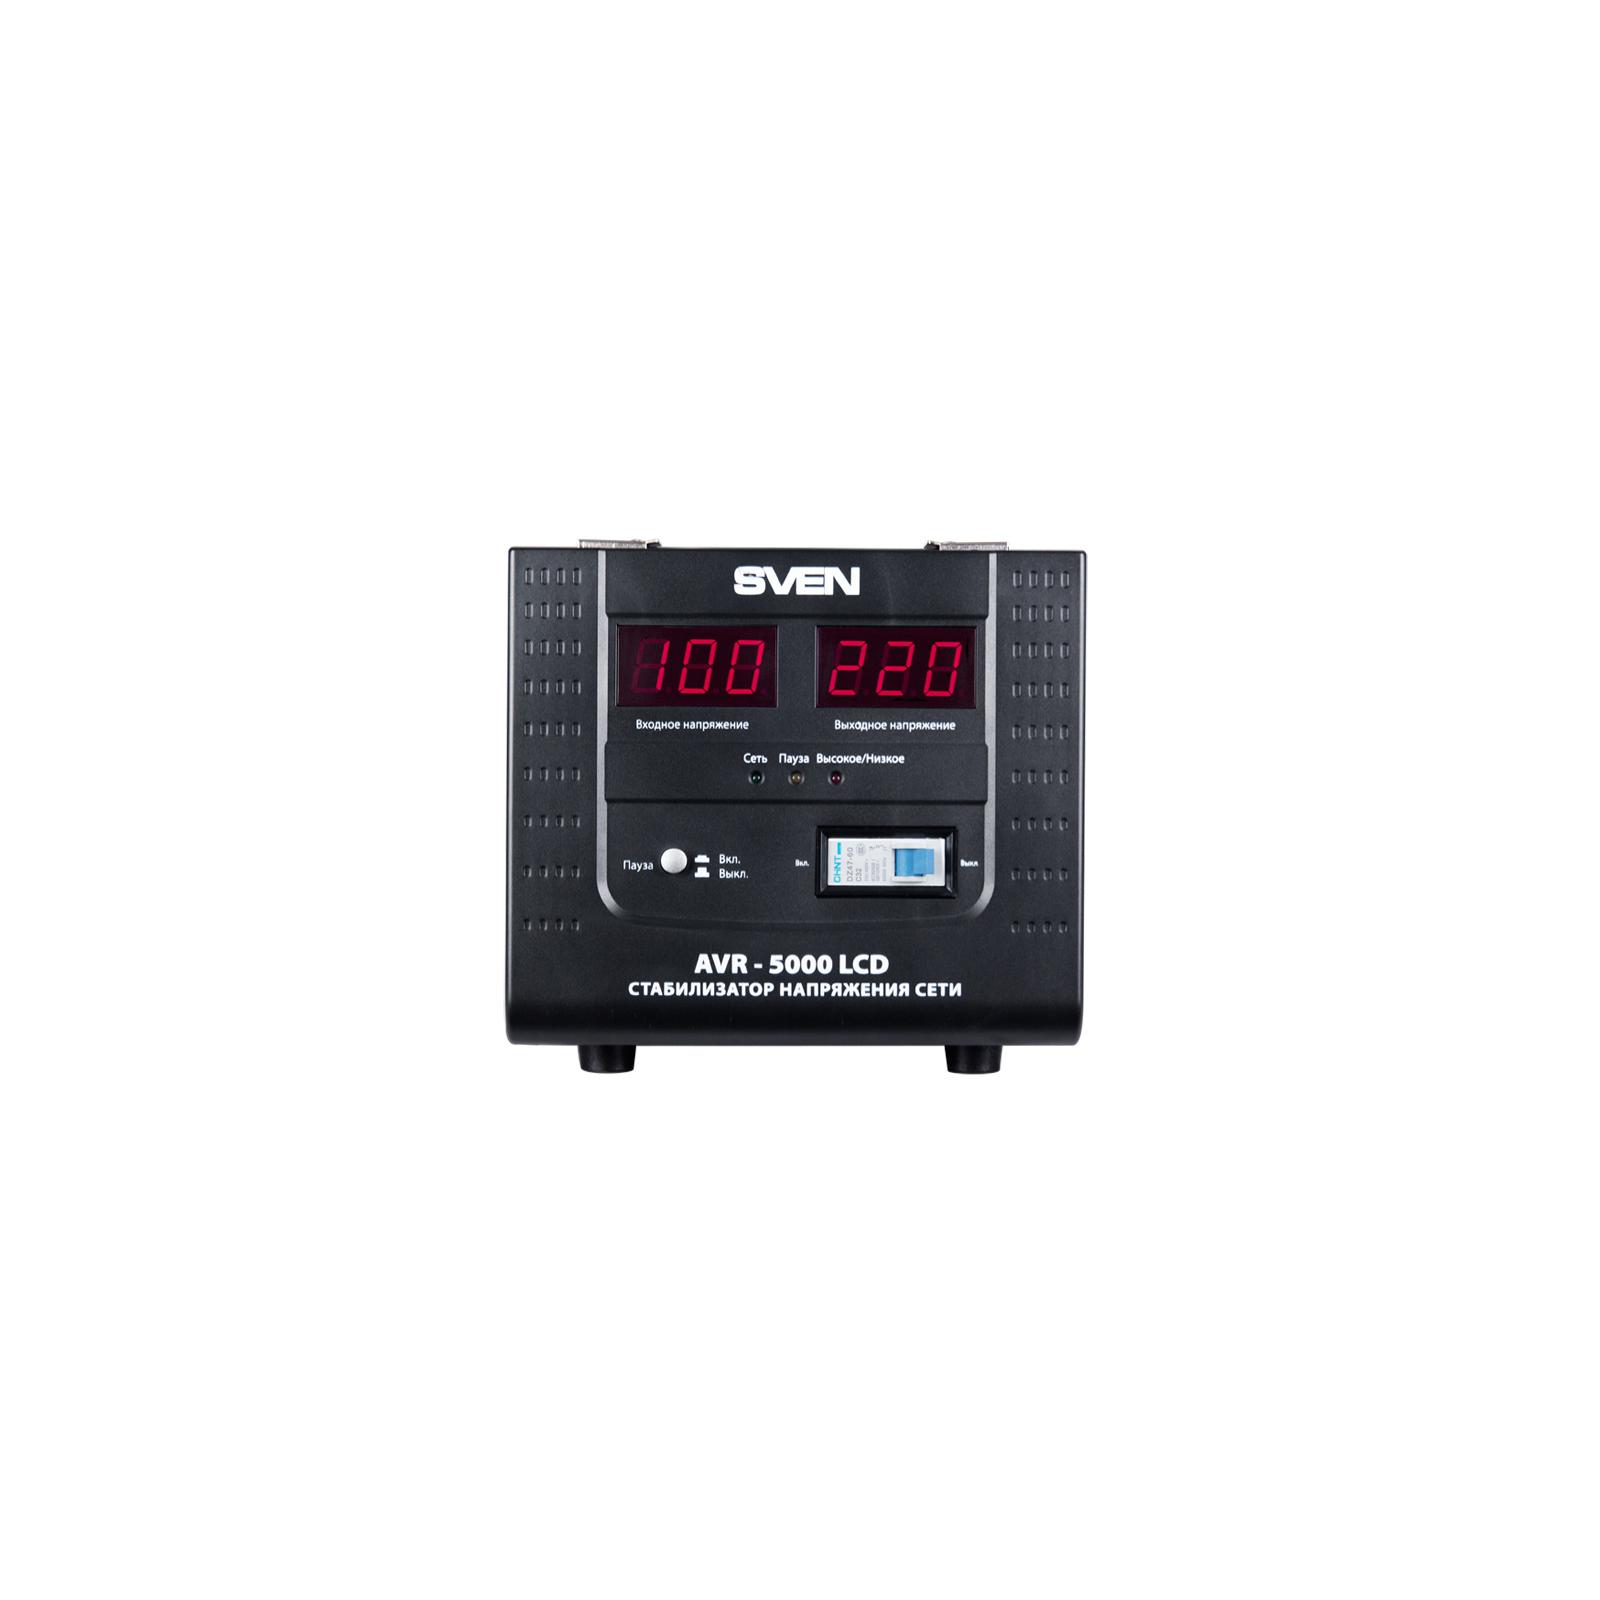 Стабилизатор SVEN AVR-5000 LCD изображение 2